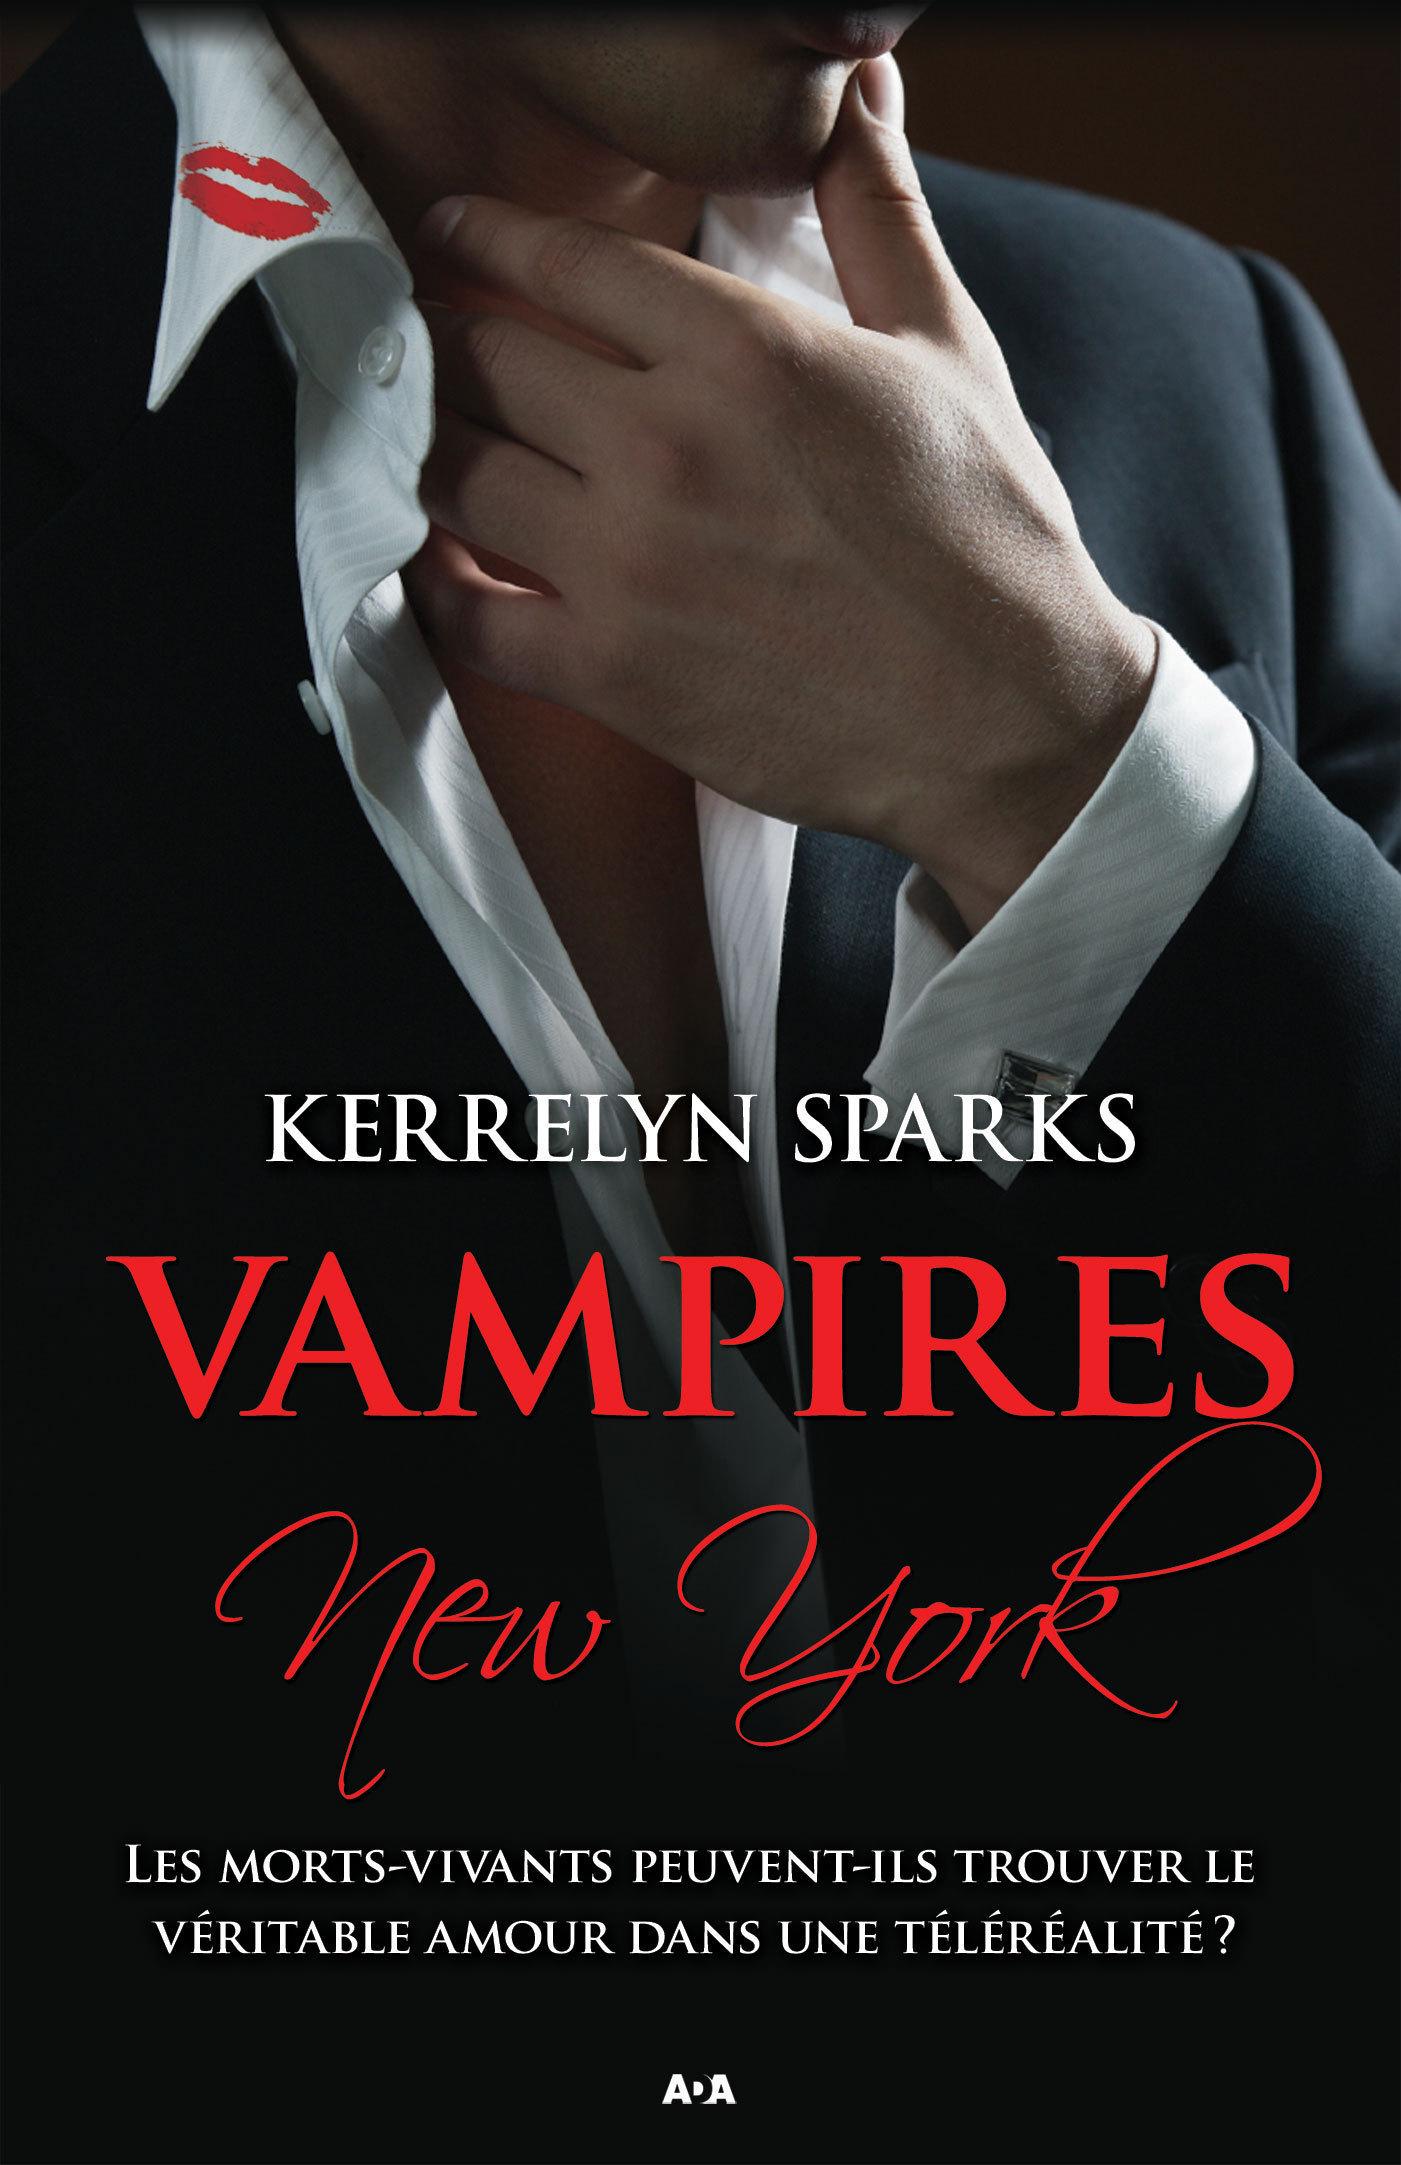 Vampires à New York